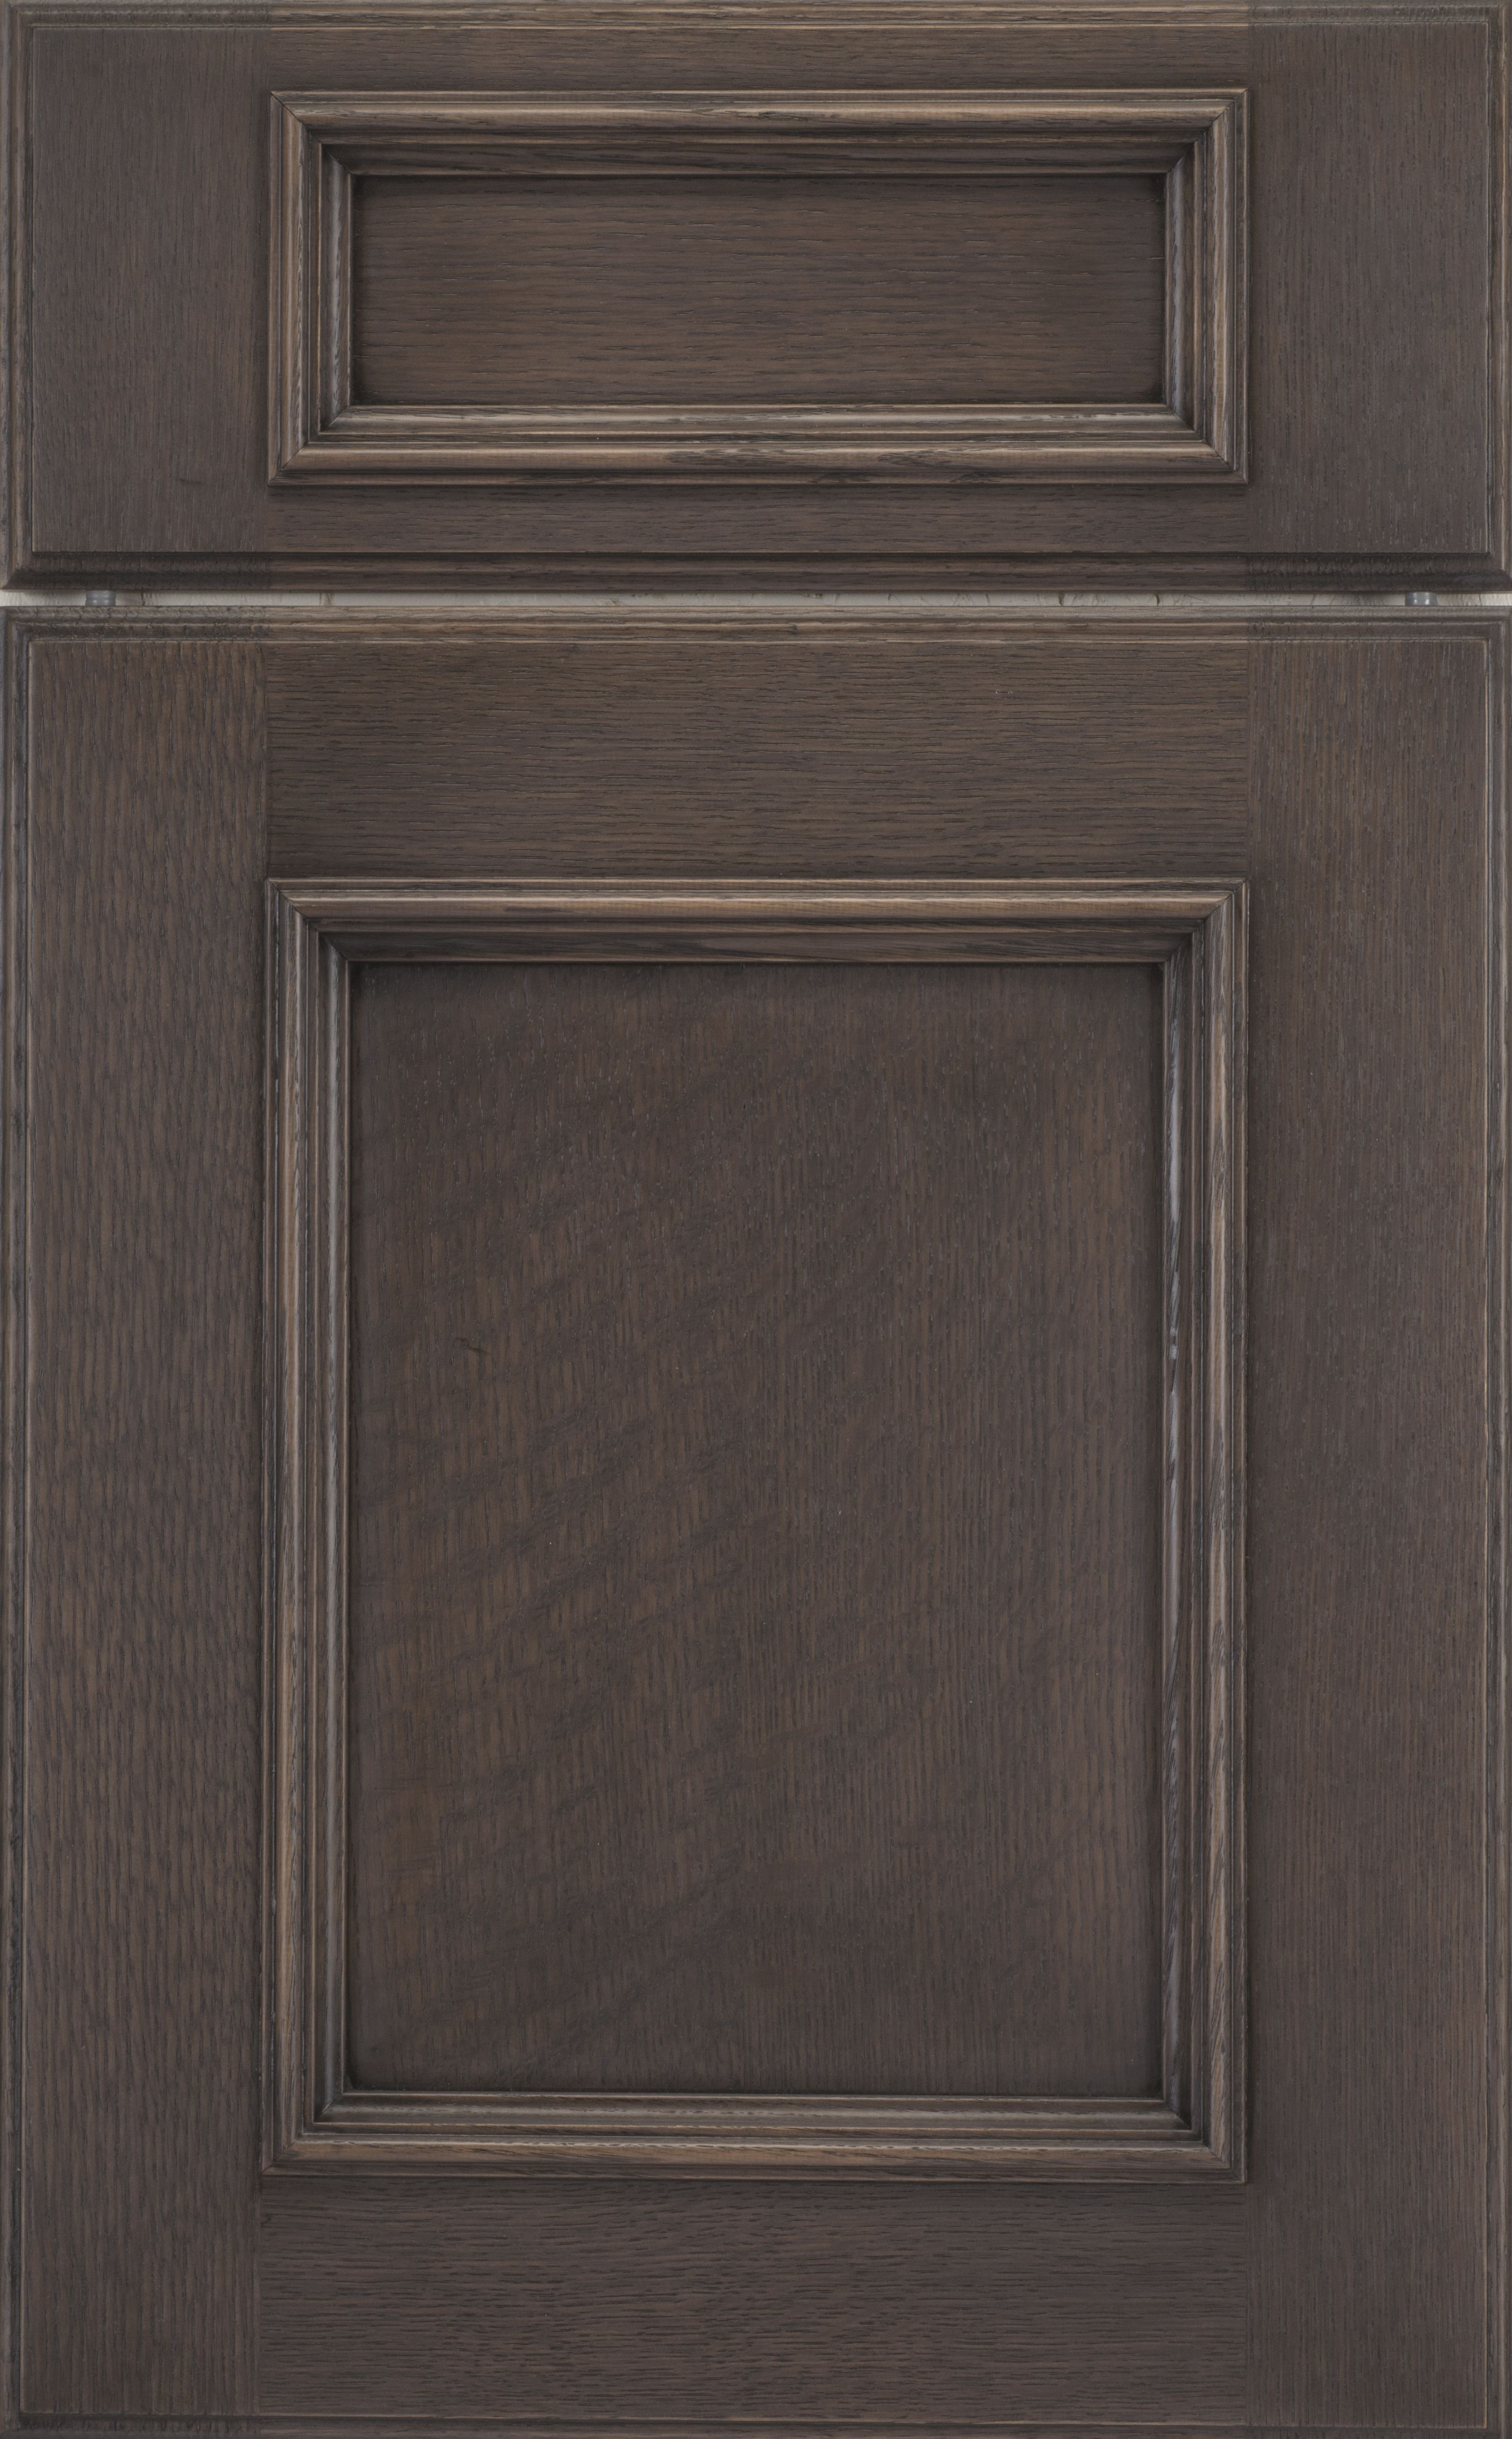 Deer Park Recessed Door Style By Woodmode Shown In Matte